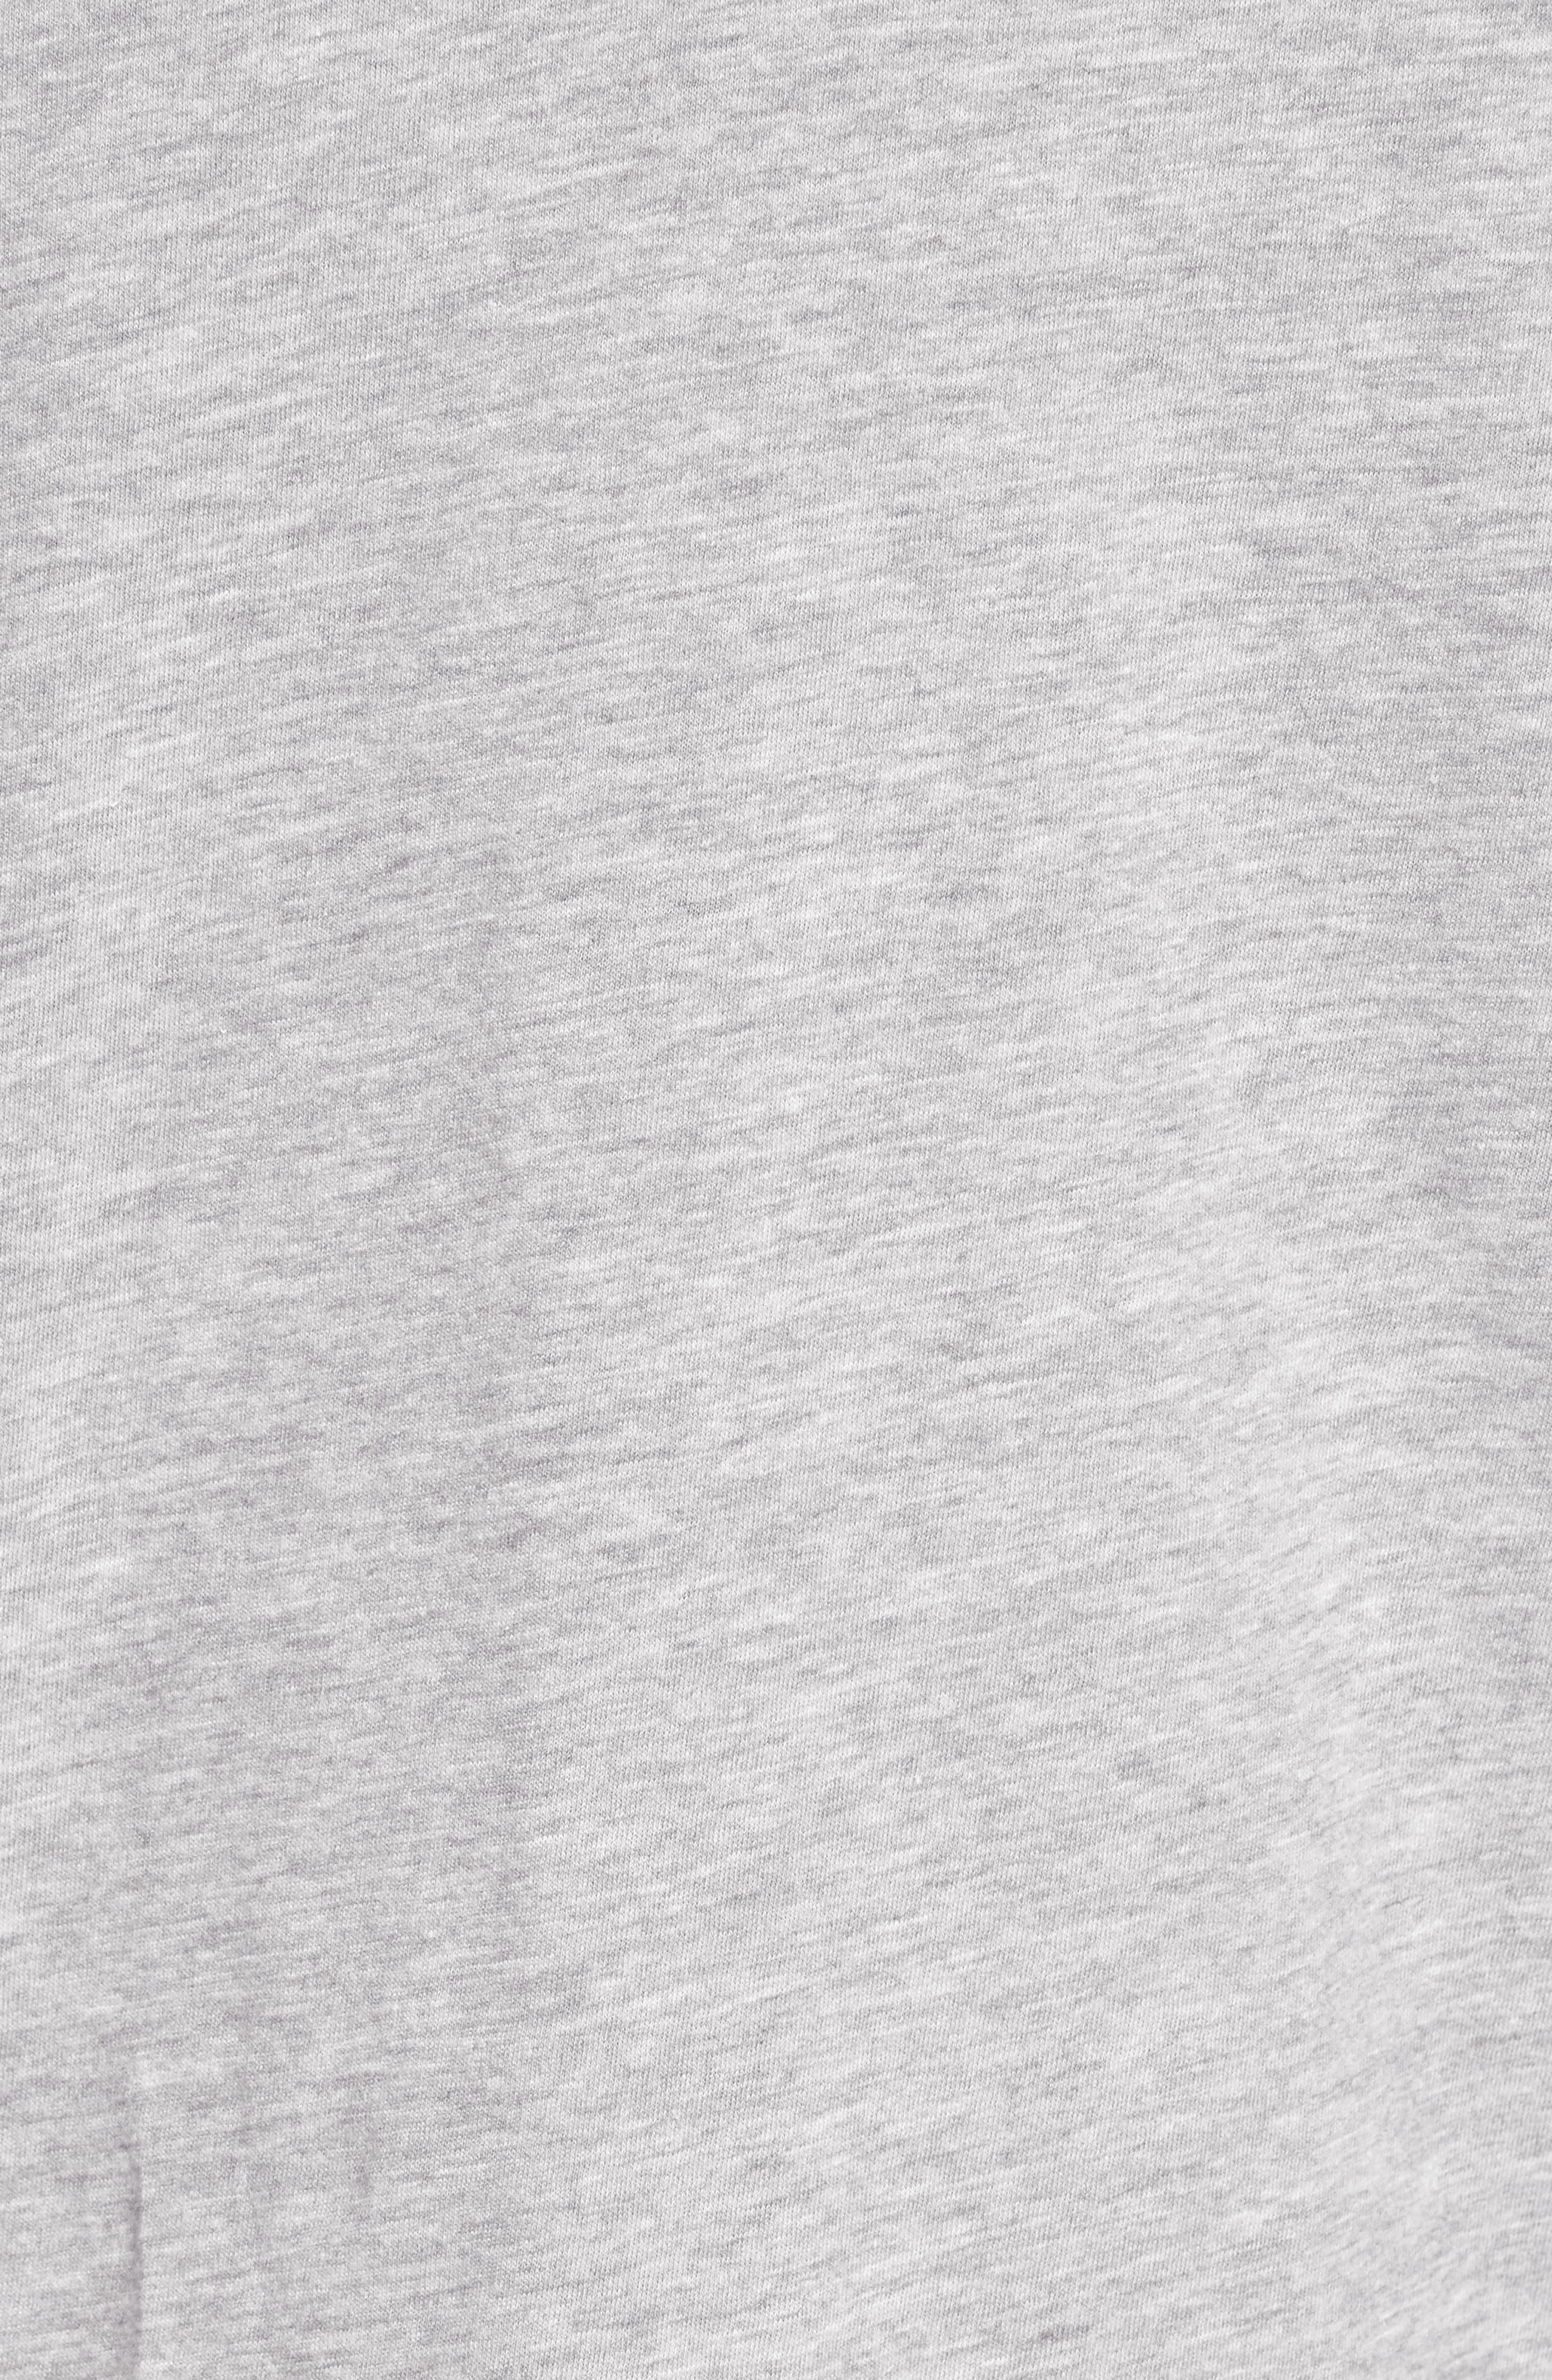 Pick Up Hooded Henley Sweatshirt,                             Alternate thumbnail 5, color,                             021